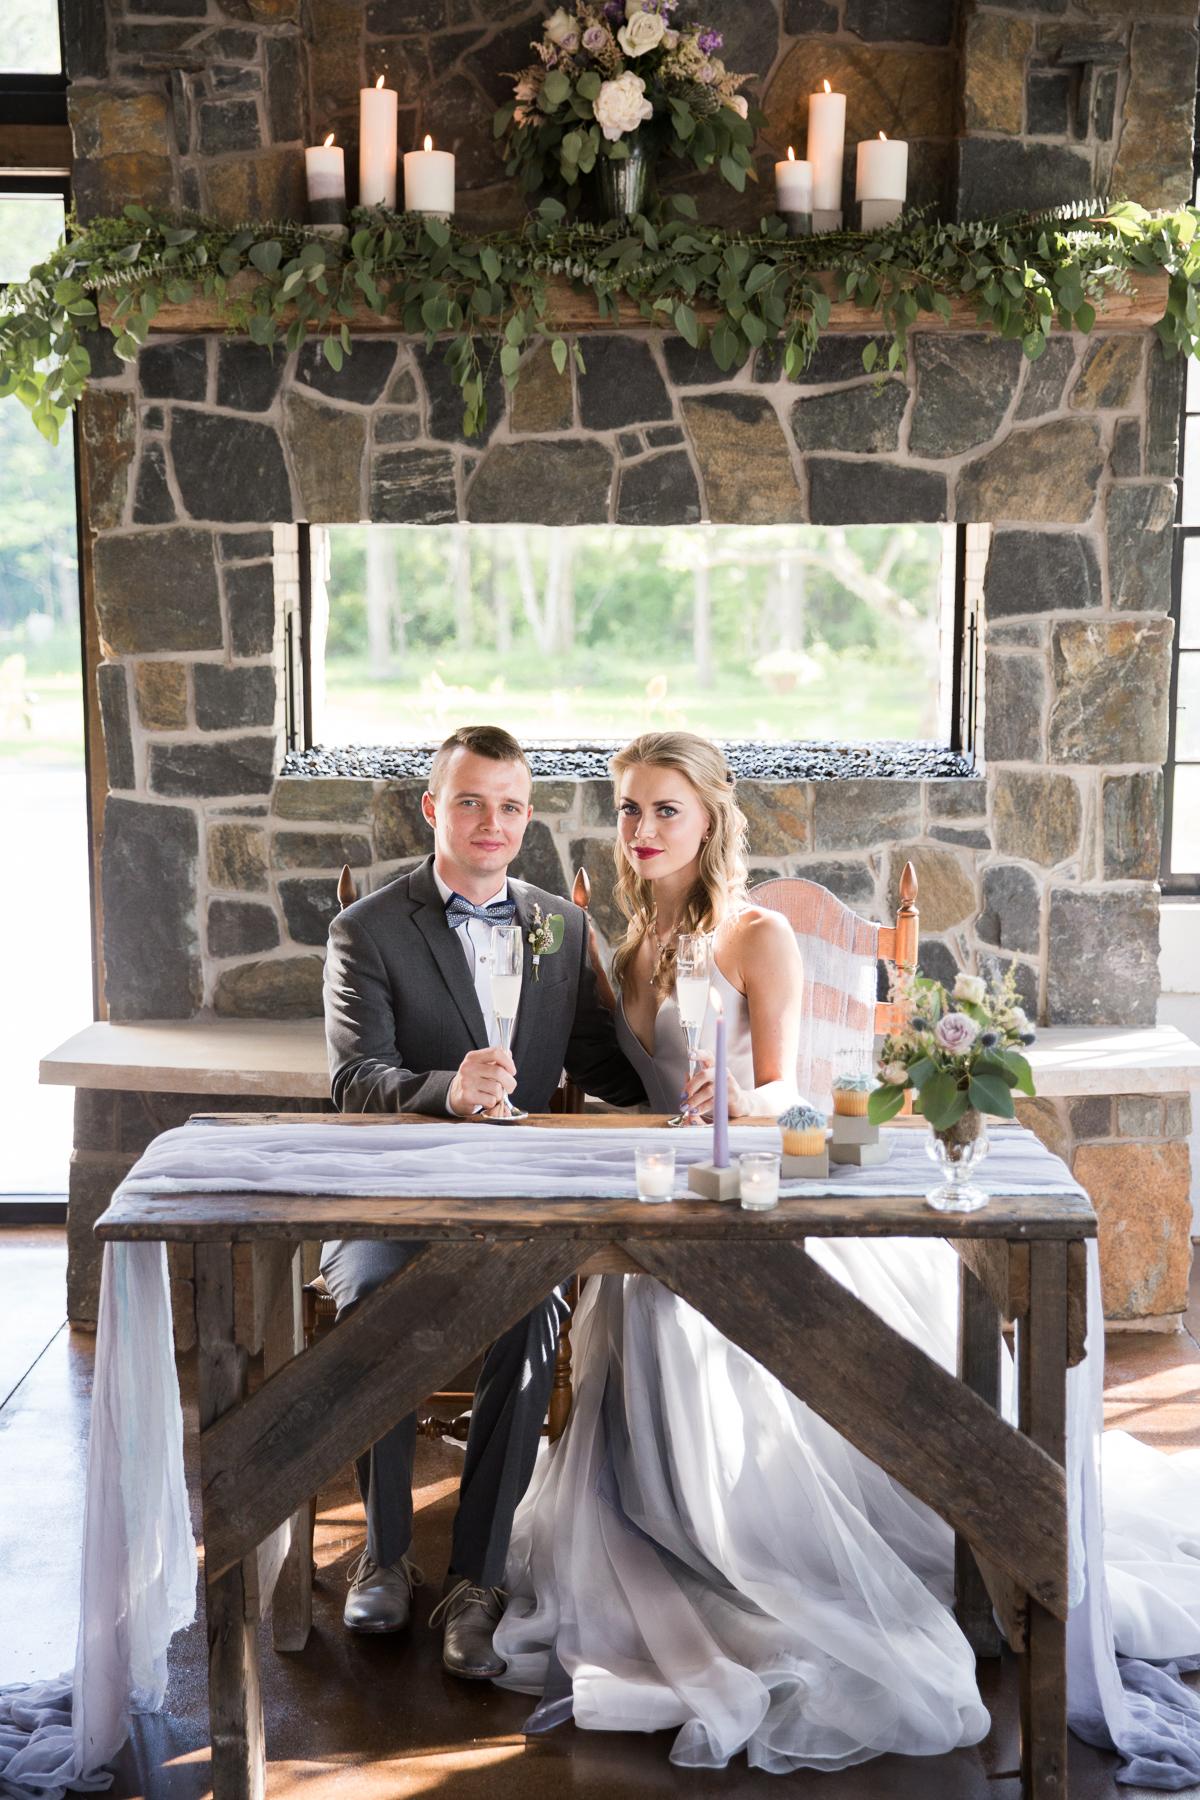 Nick-Natasha-Studio-Styled-Wedding-Sinclair-of-Skaneateles-NY-1372.jpg